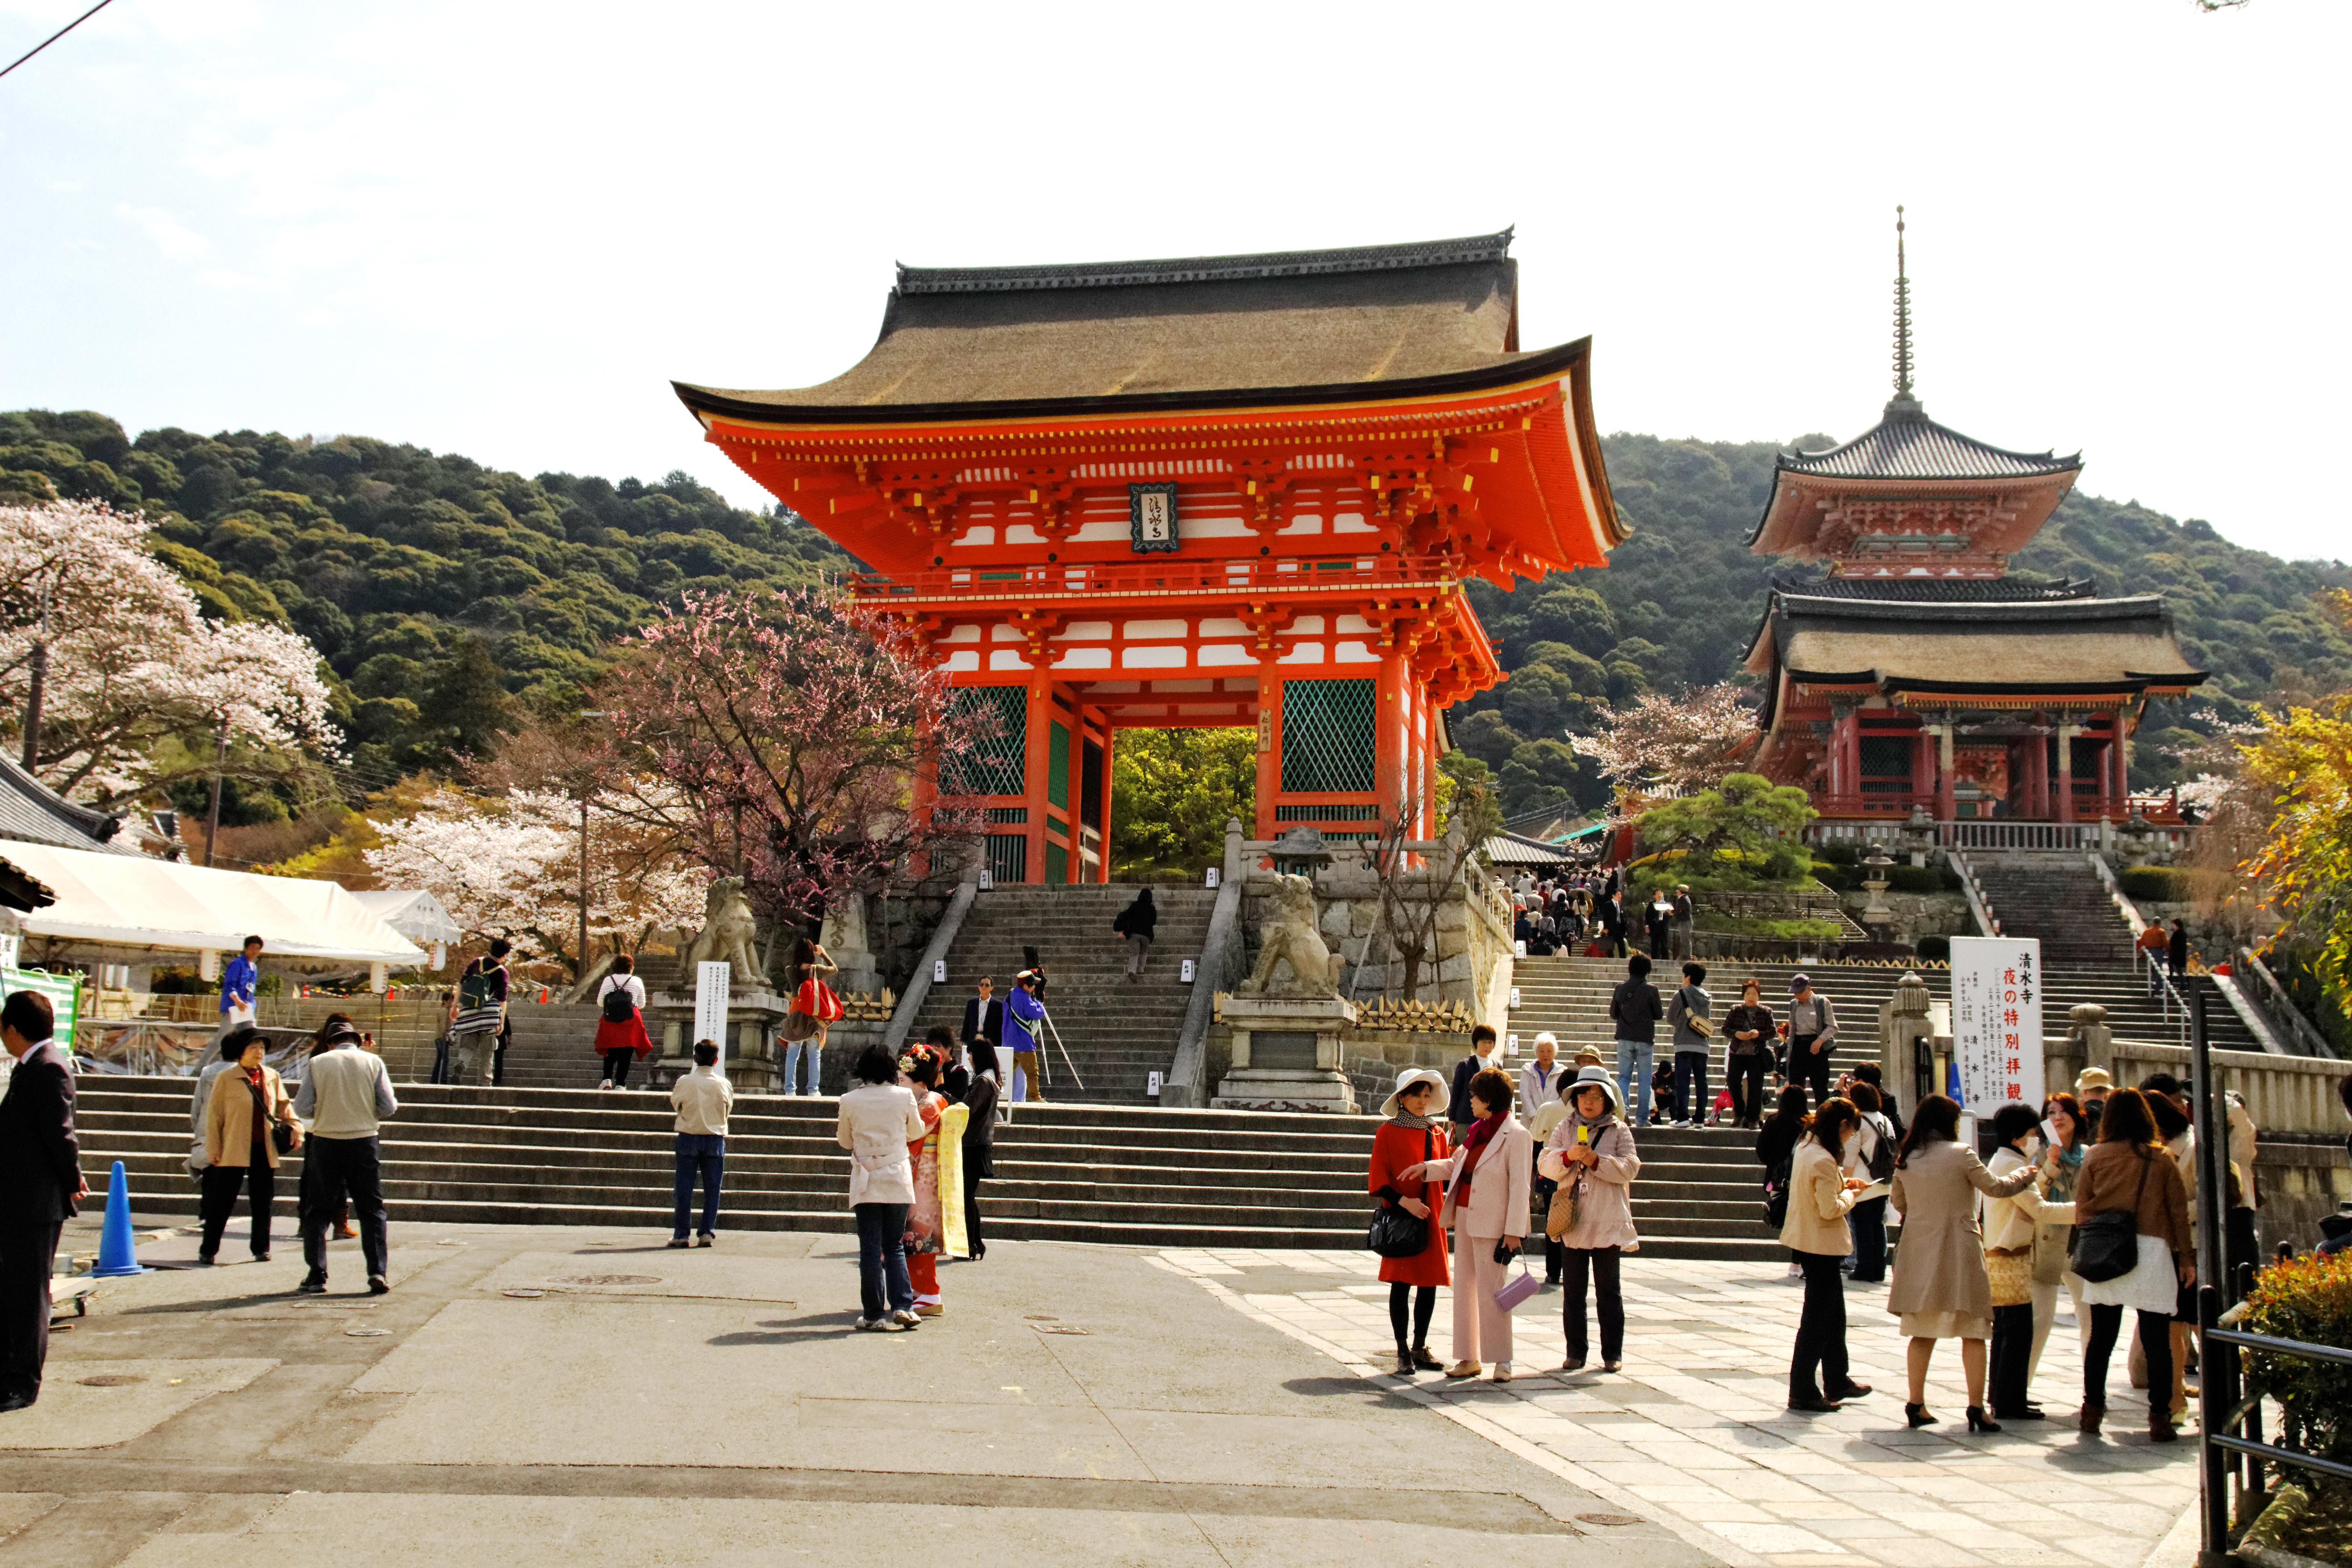 Templo de Kiyomizu-dera, Kyoto, Japão